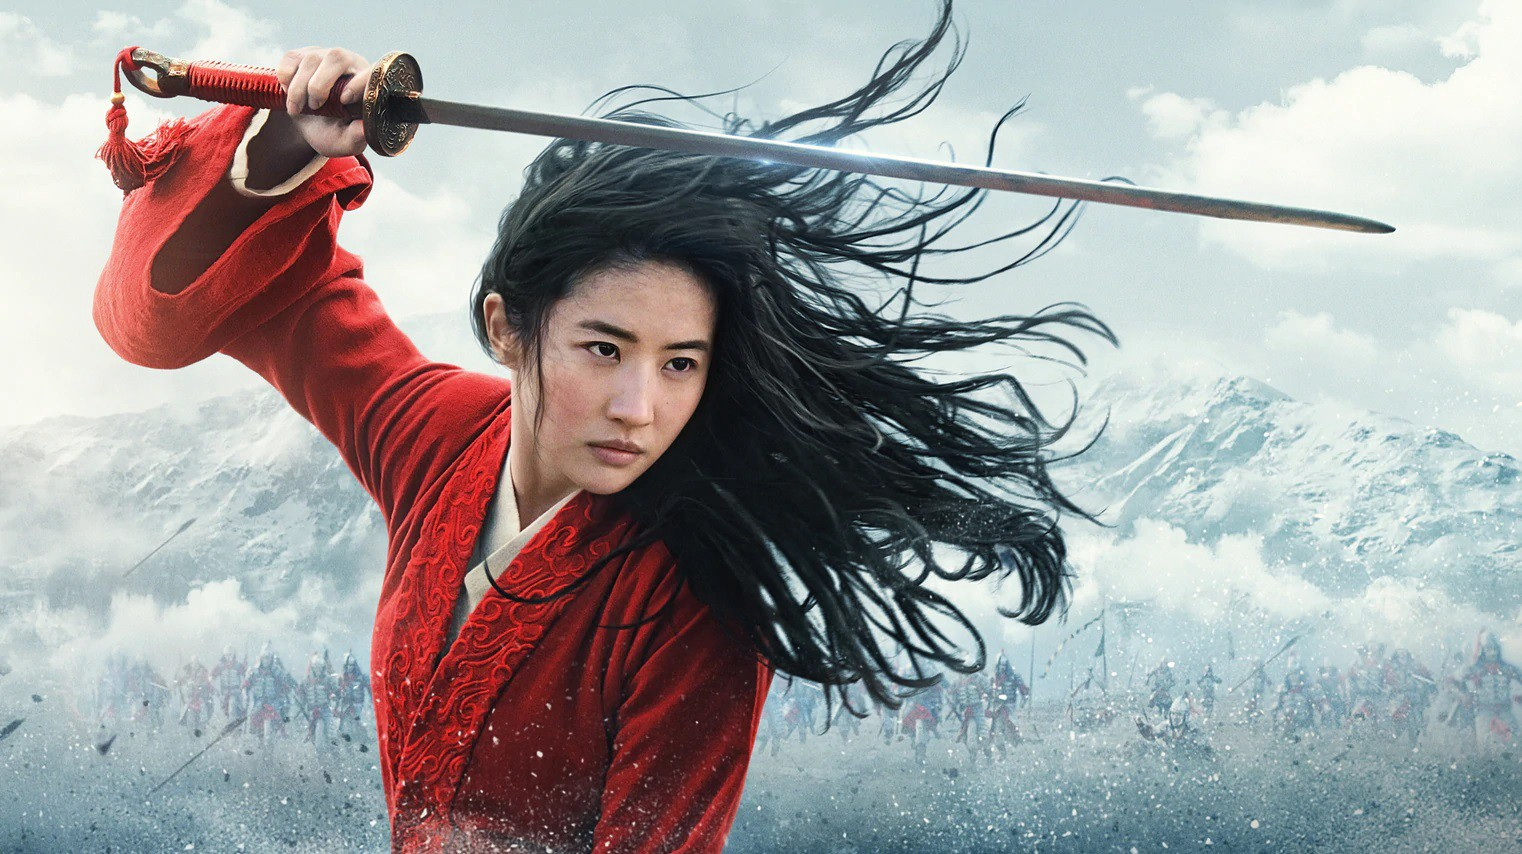 Mulan (2020) is Disney's Worst Remake Yet | by Maxance Vincent | Cinemania  | Medium